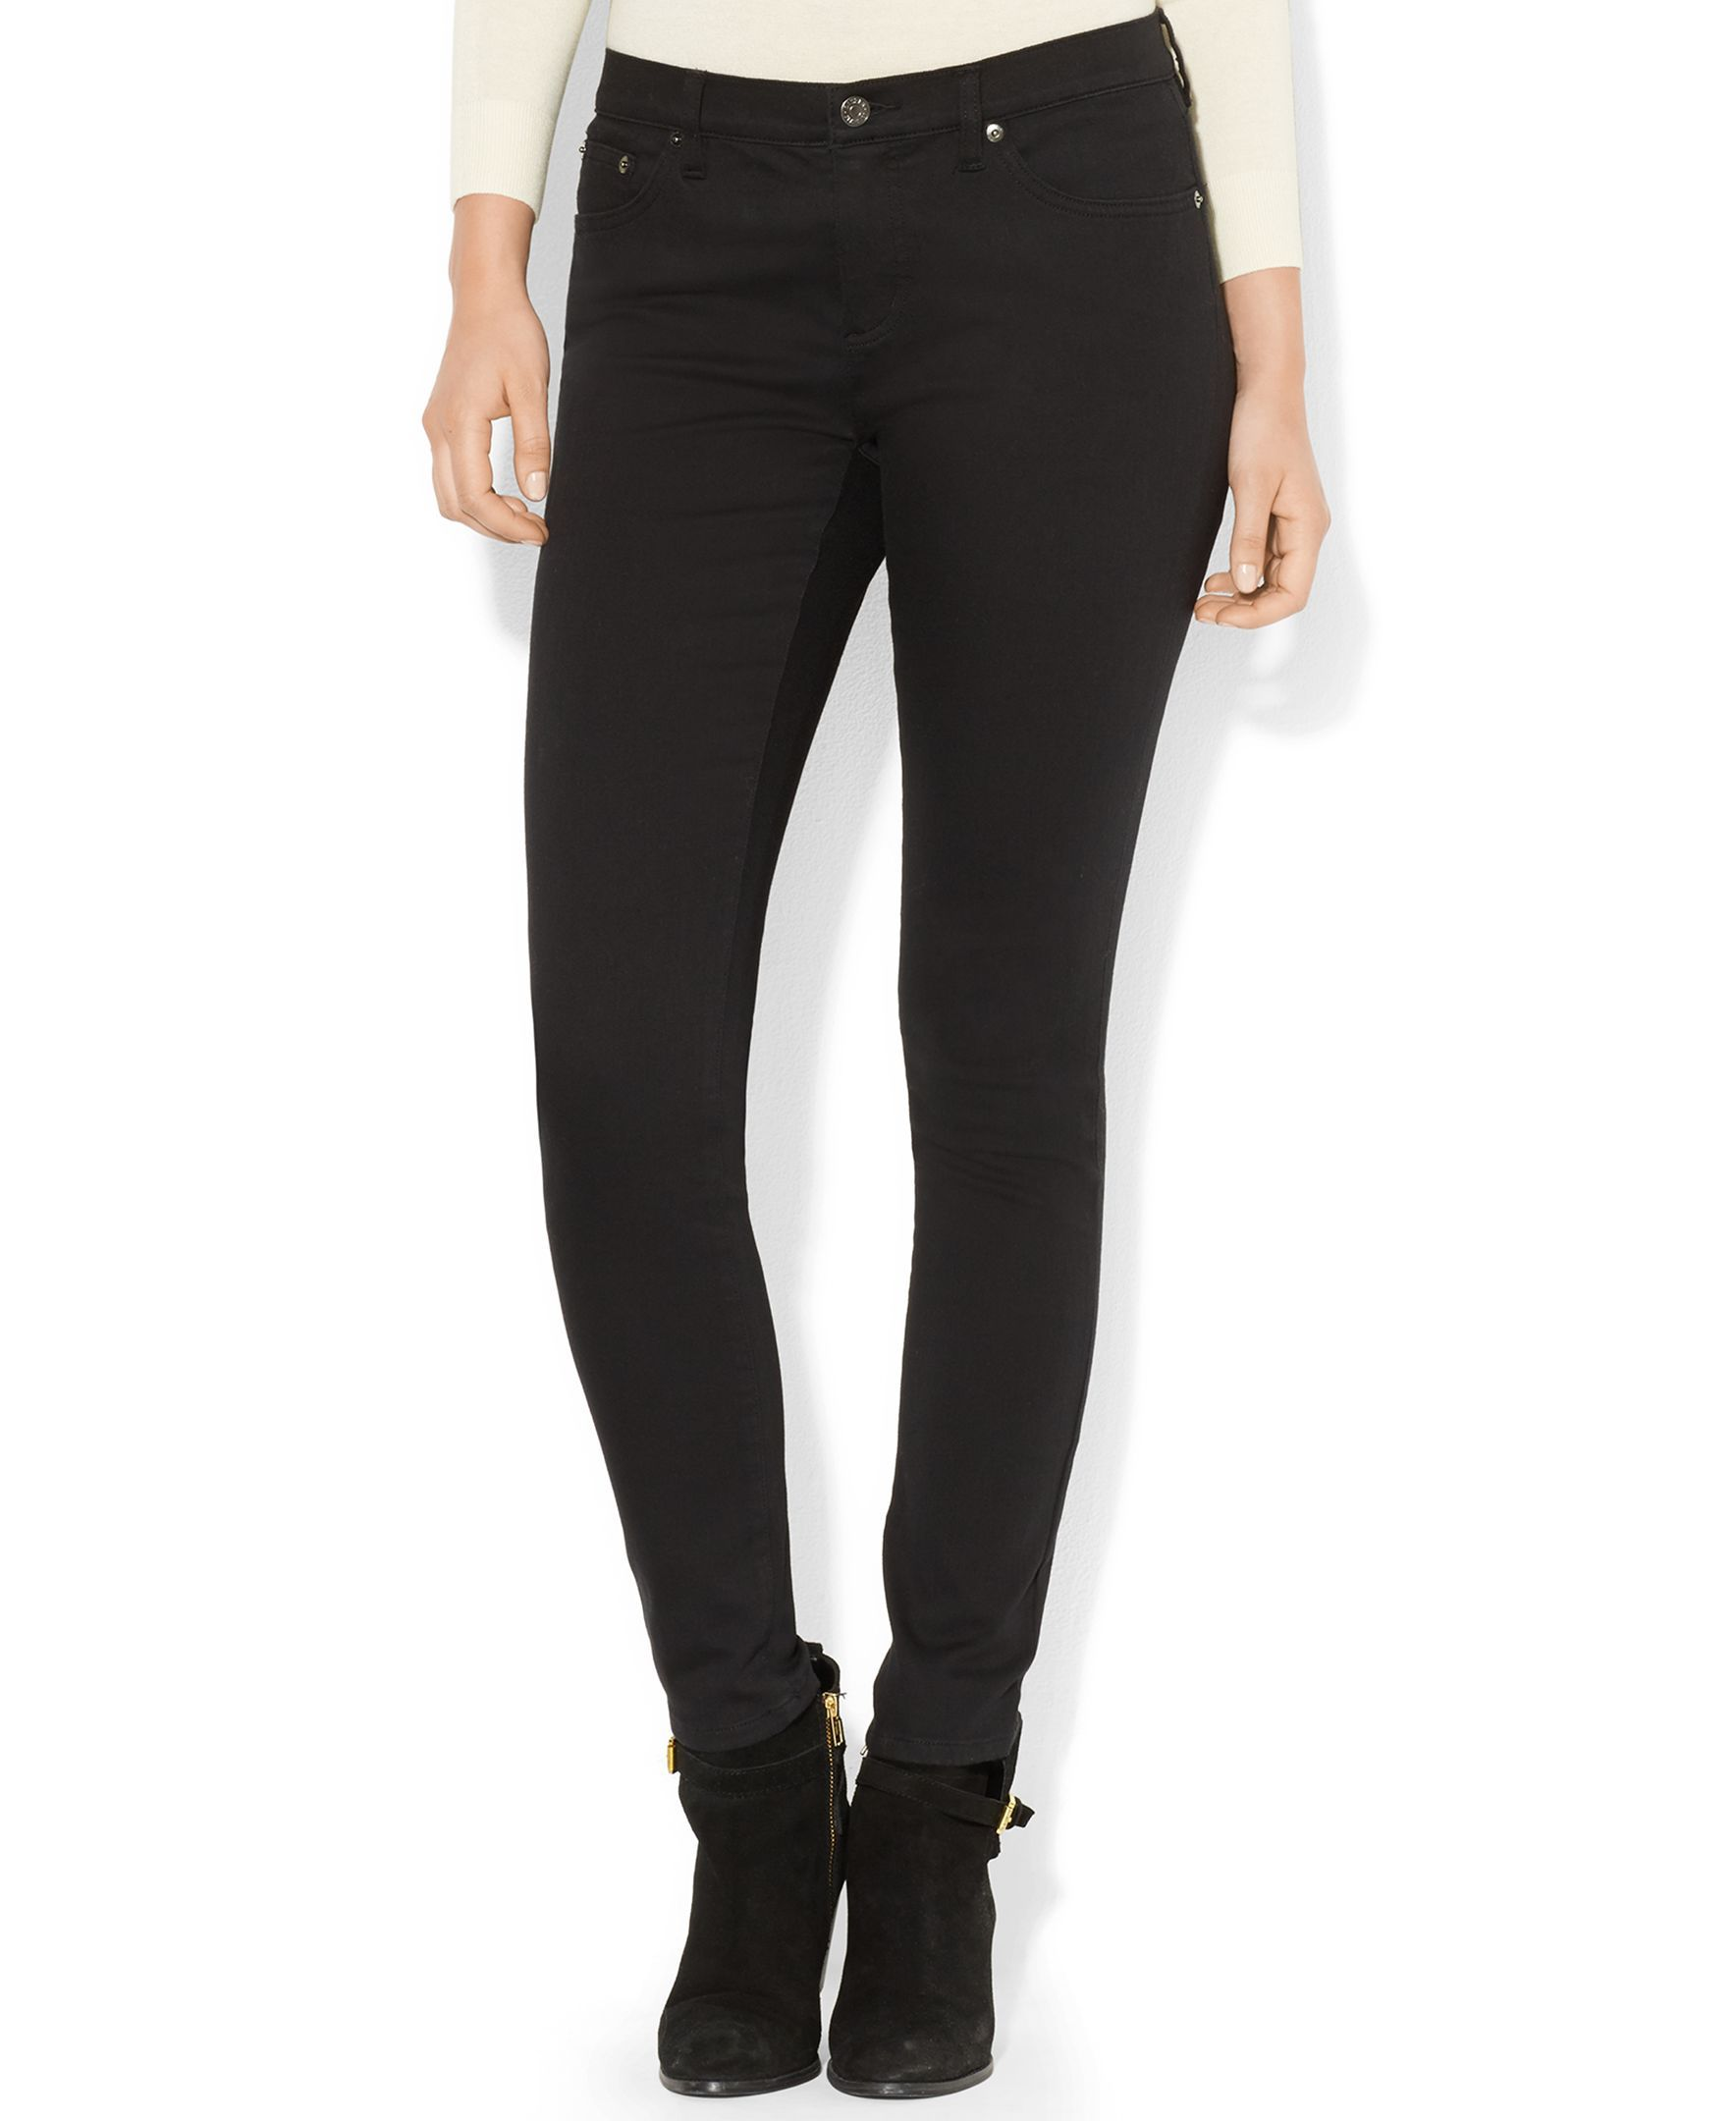 Lauren Jeans Co. Super-Stretch Skinny-Leg Jeans, Black Wash